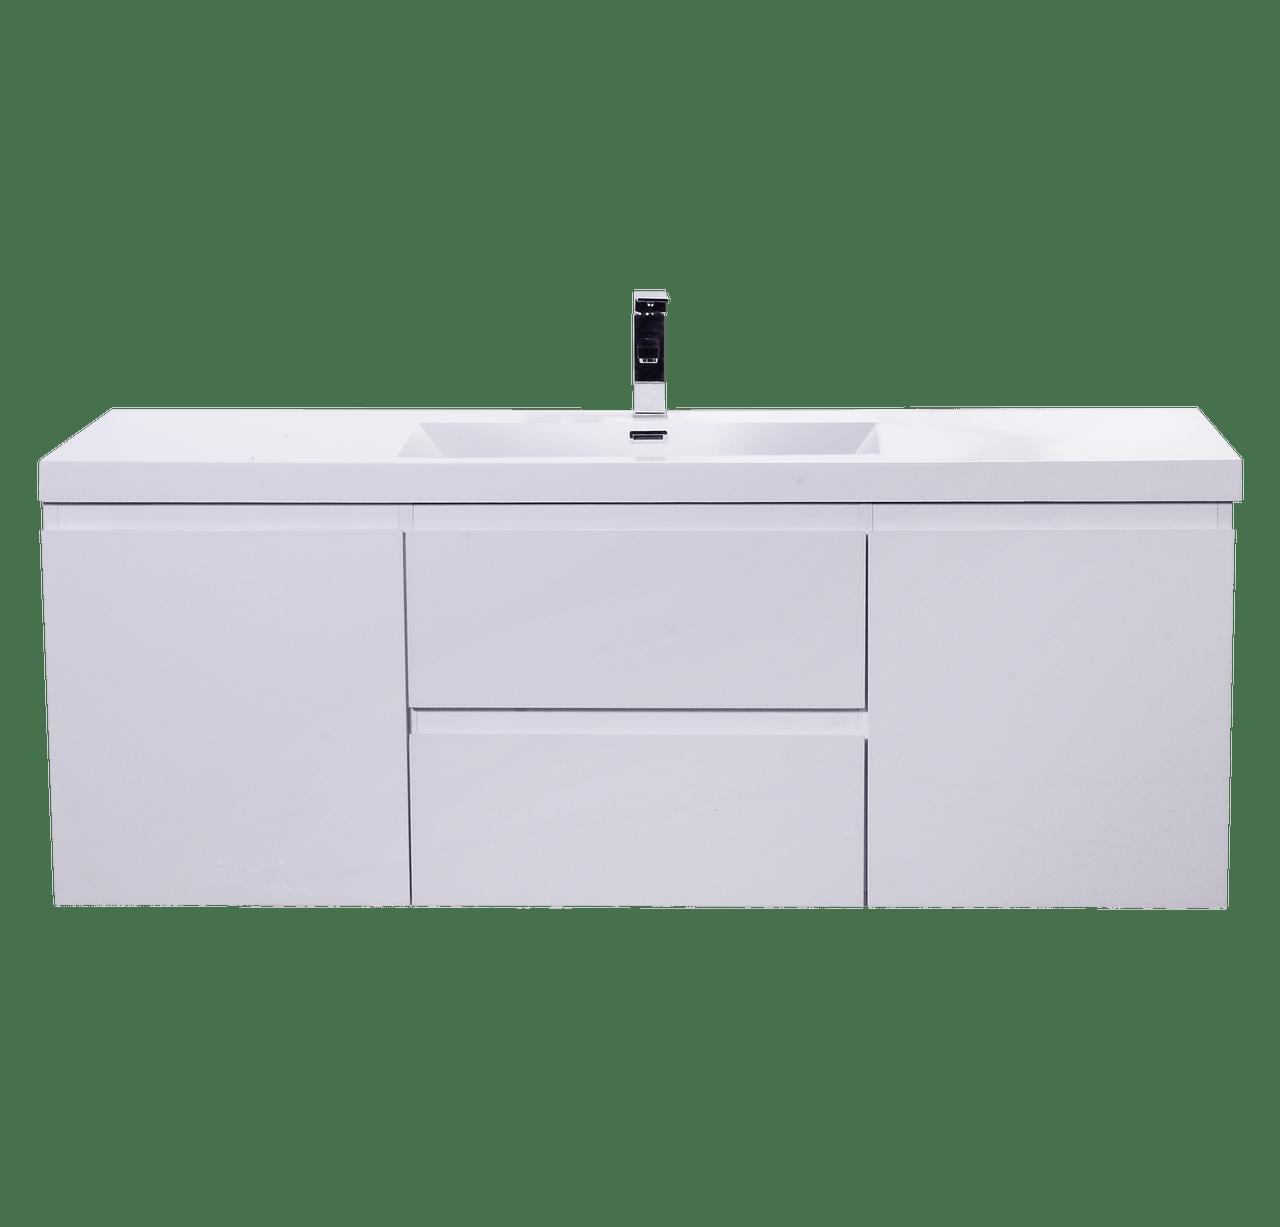 moreno mob 60 single sink high gloss white wall mounted modern bathroom vanity with reeinforced acrylic sink